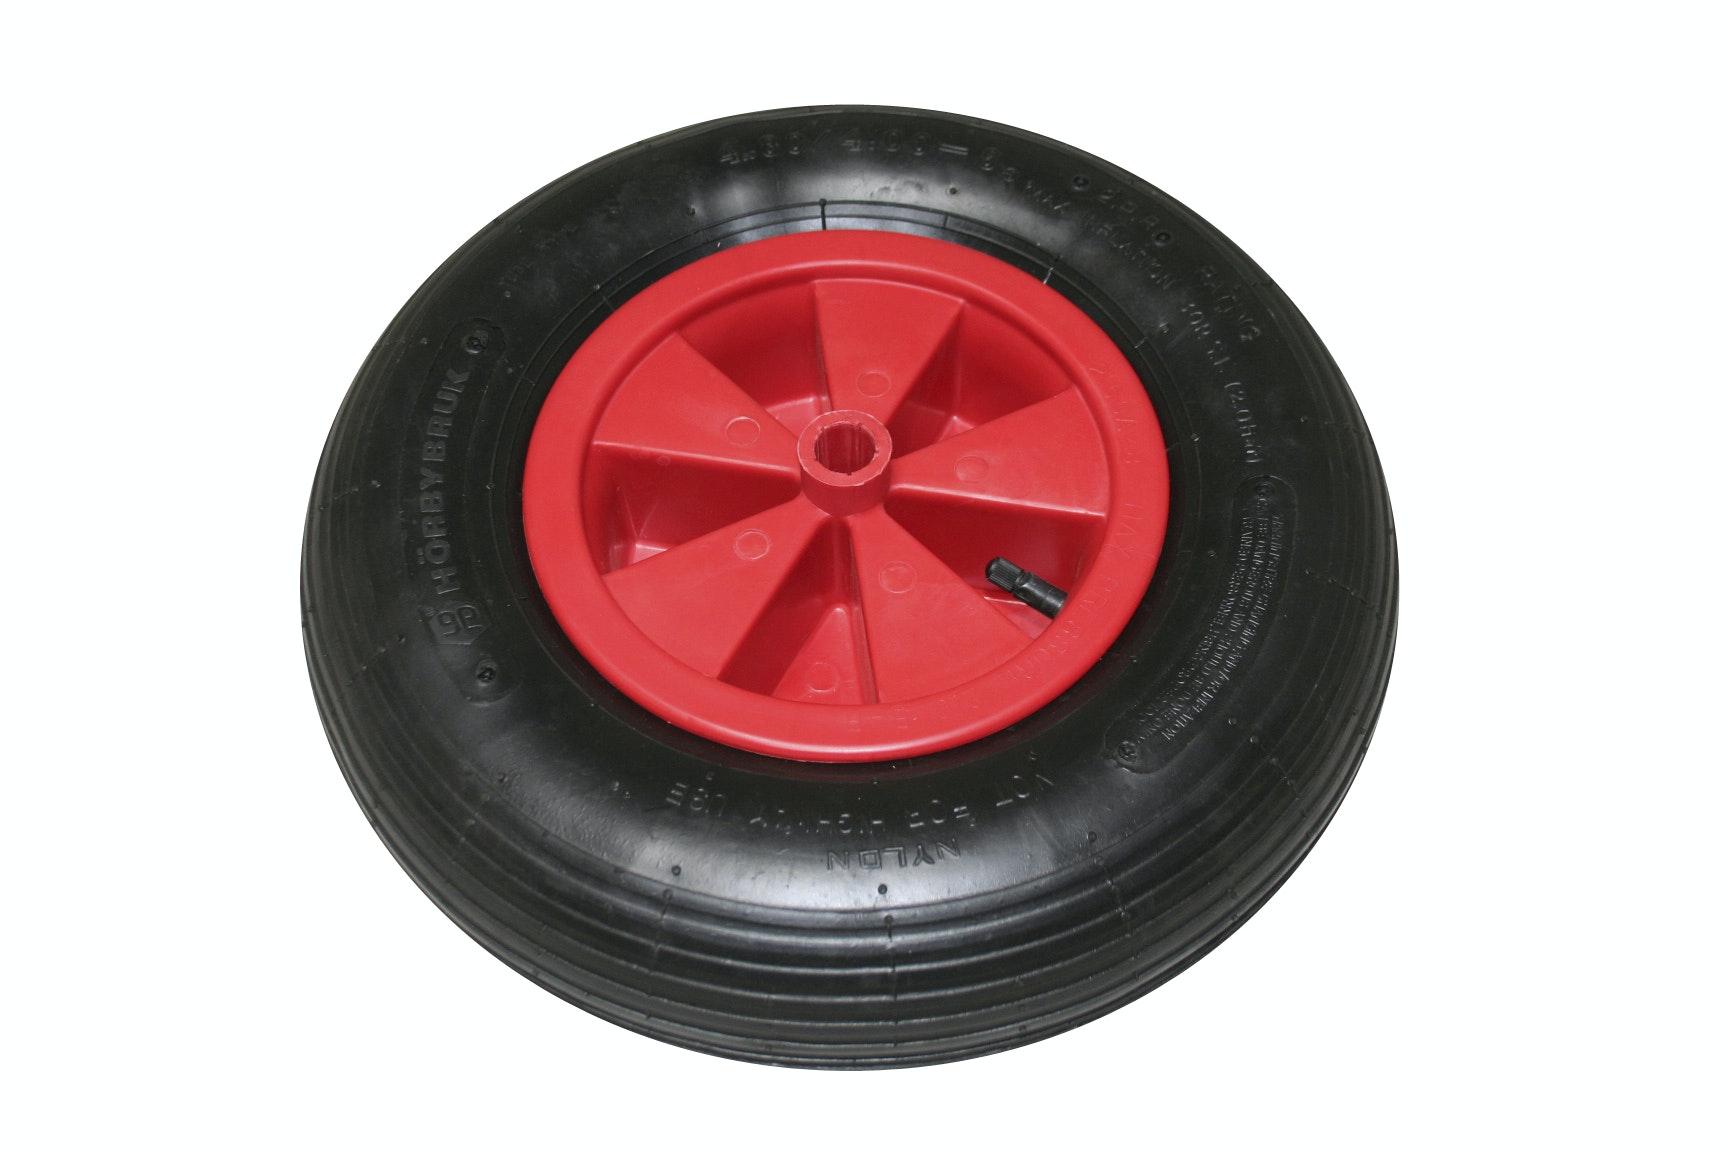 Skottkärrehjul Hörby bruk 74075